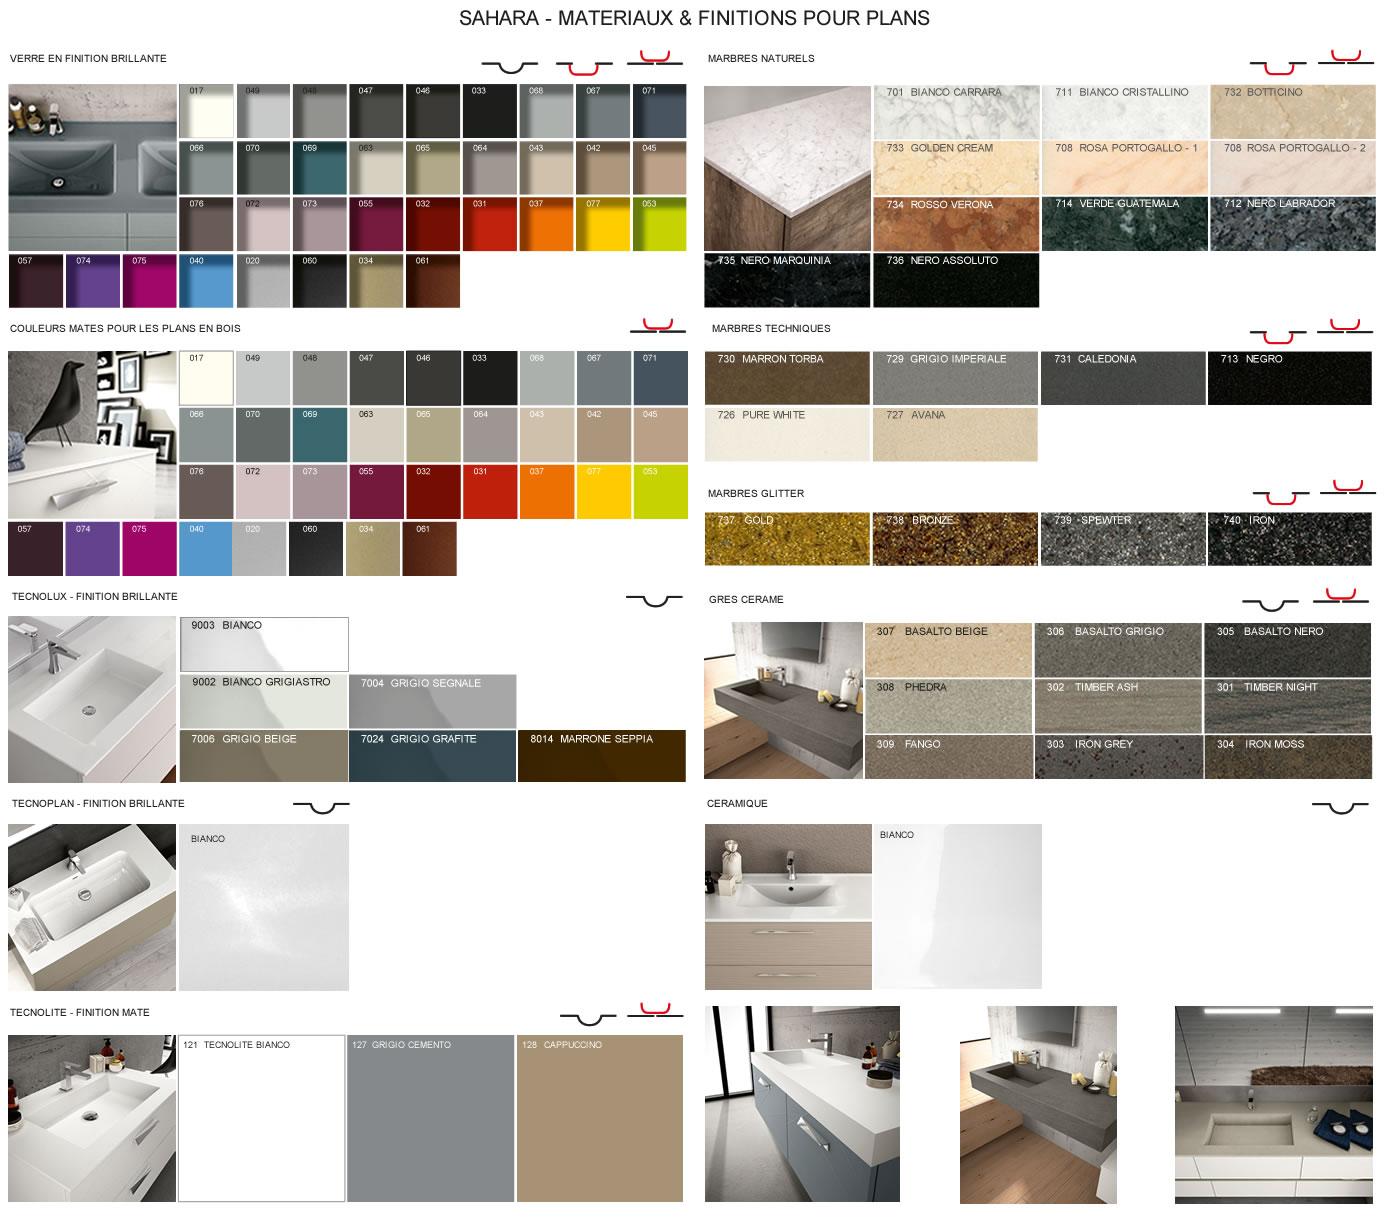 meubles de salle de bains serie sahara. Black Bedroom Furniture Sets. Home Design Ideas